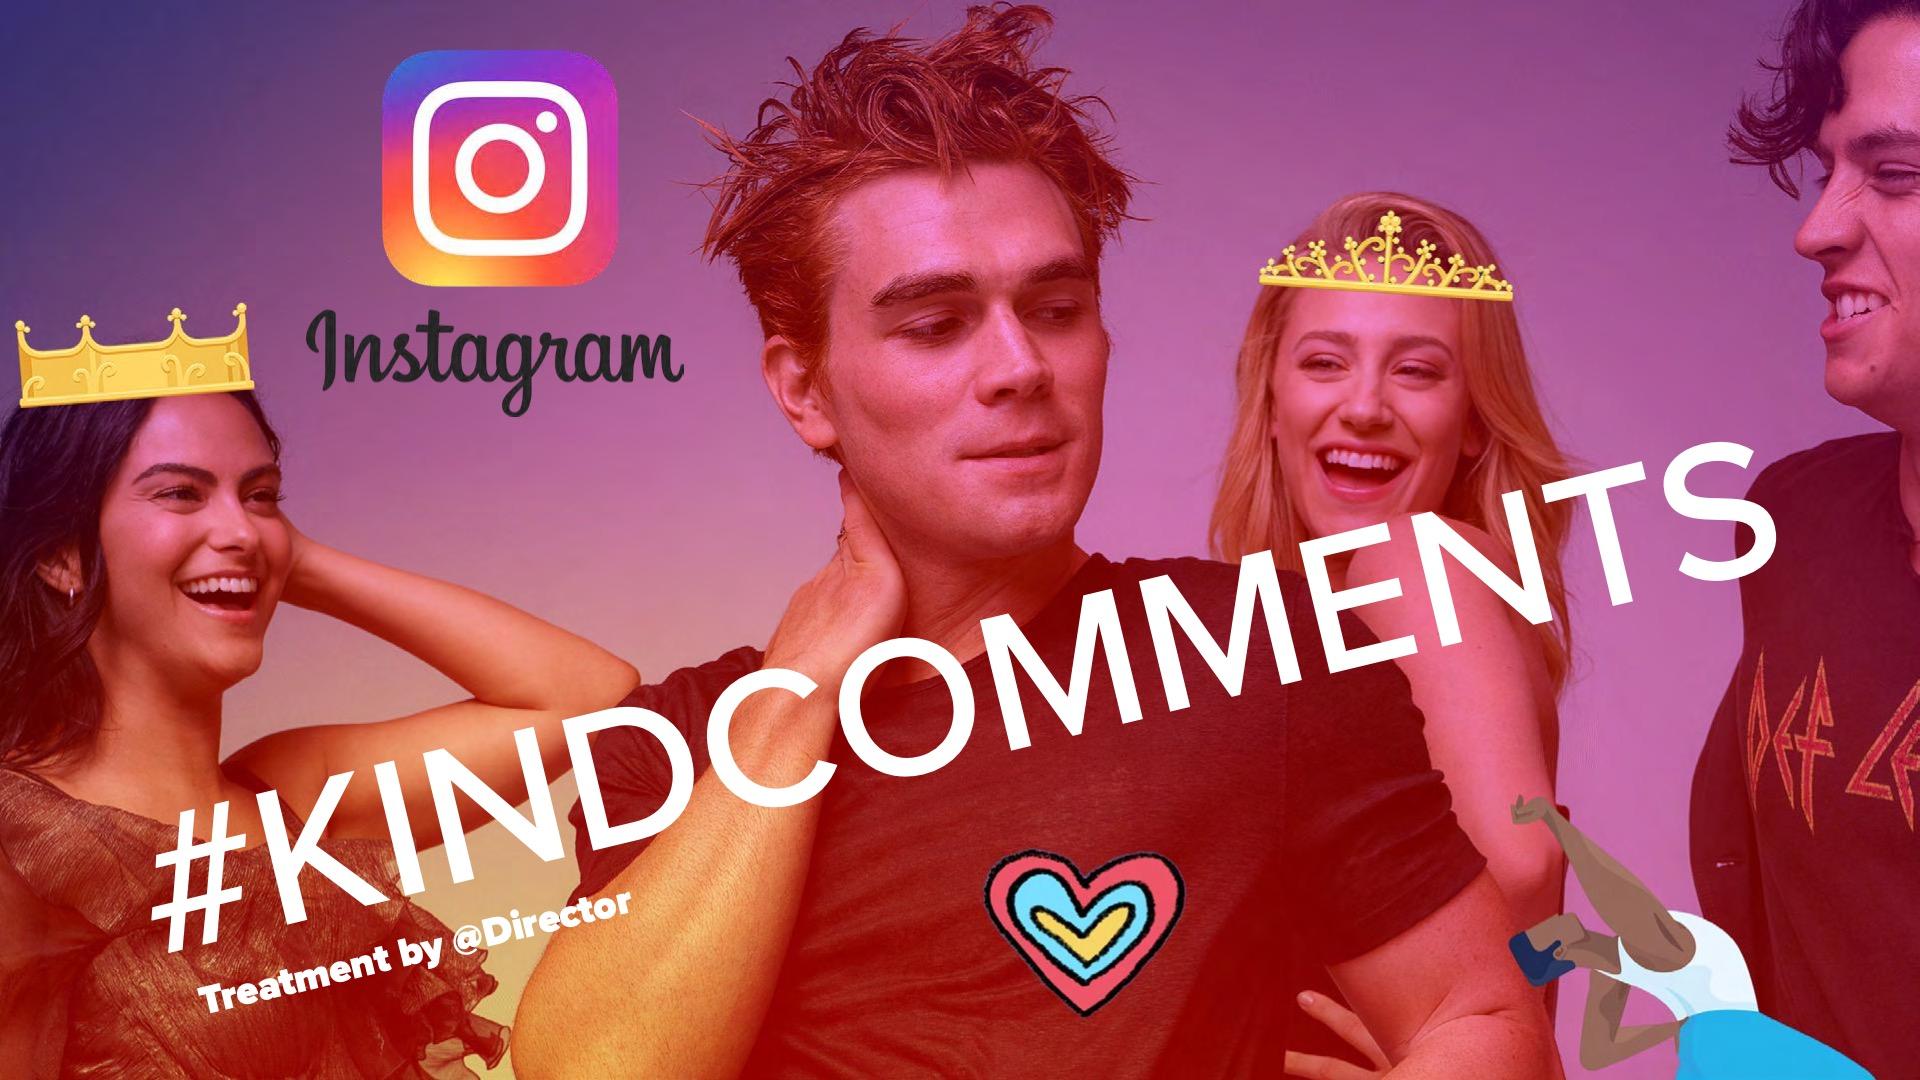 Betterment Society REN Instagram visuals sample 1.jpeg